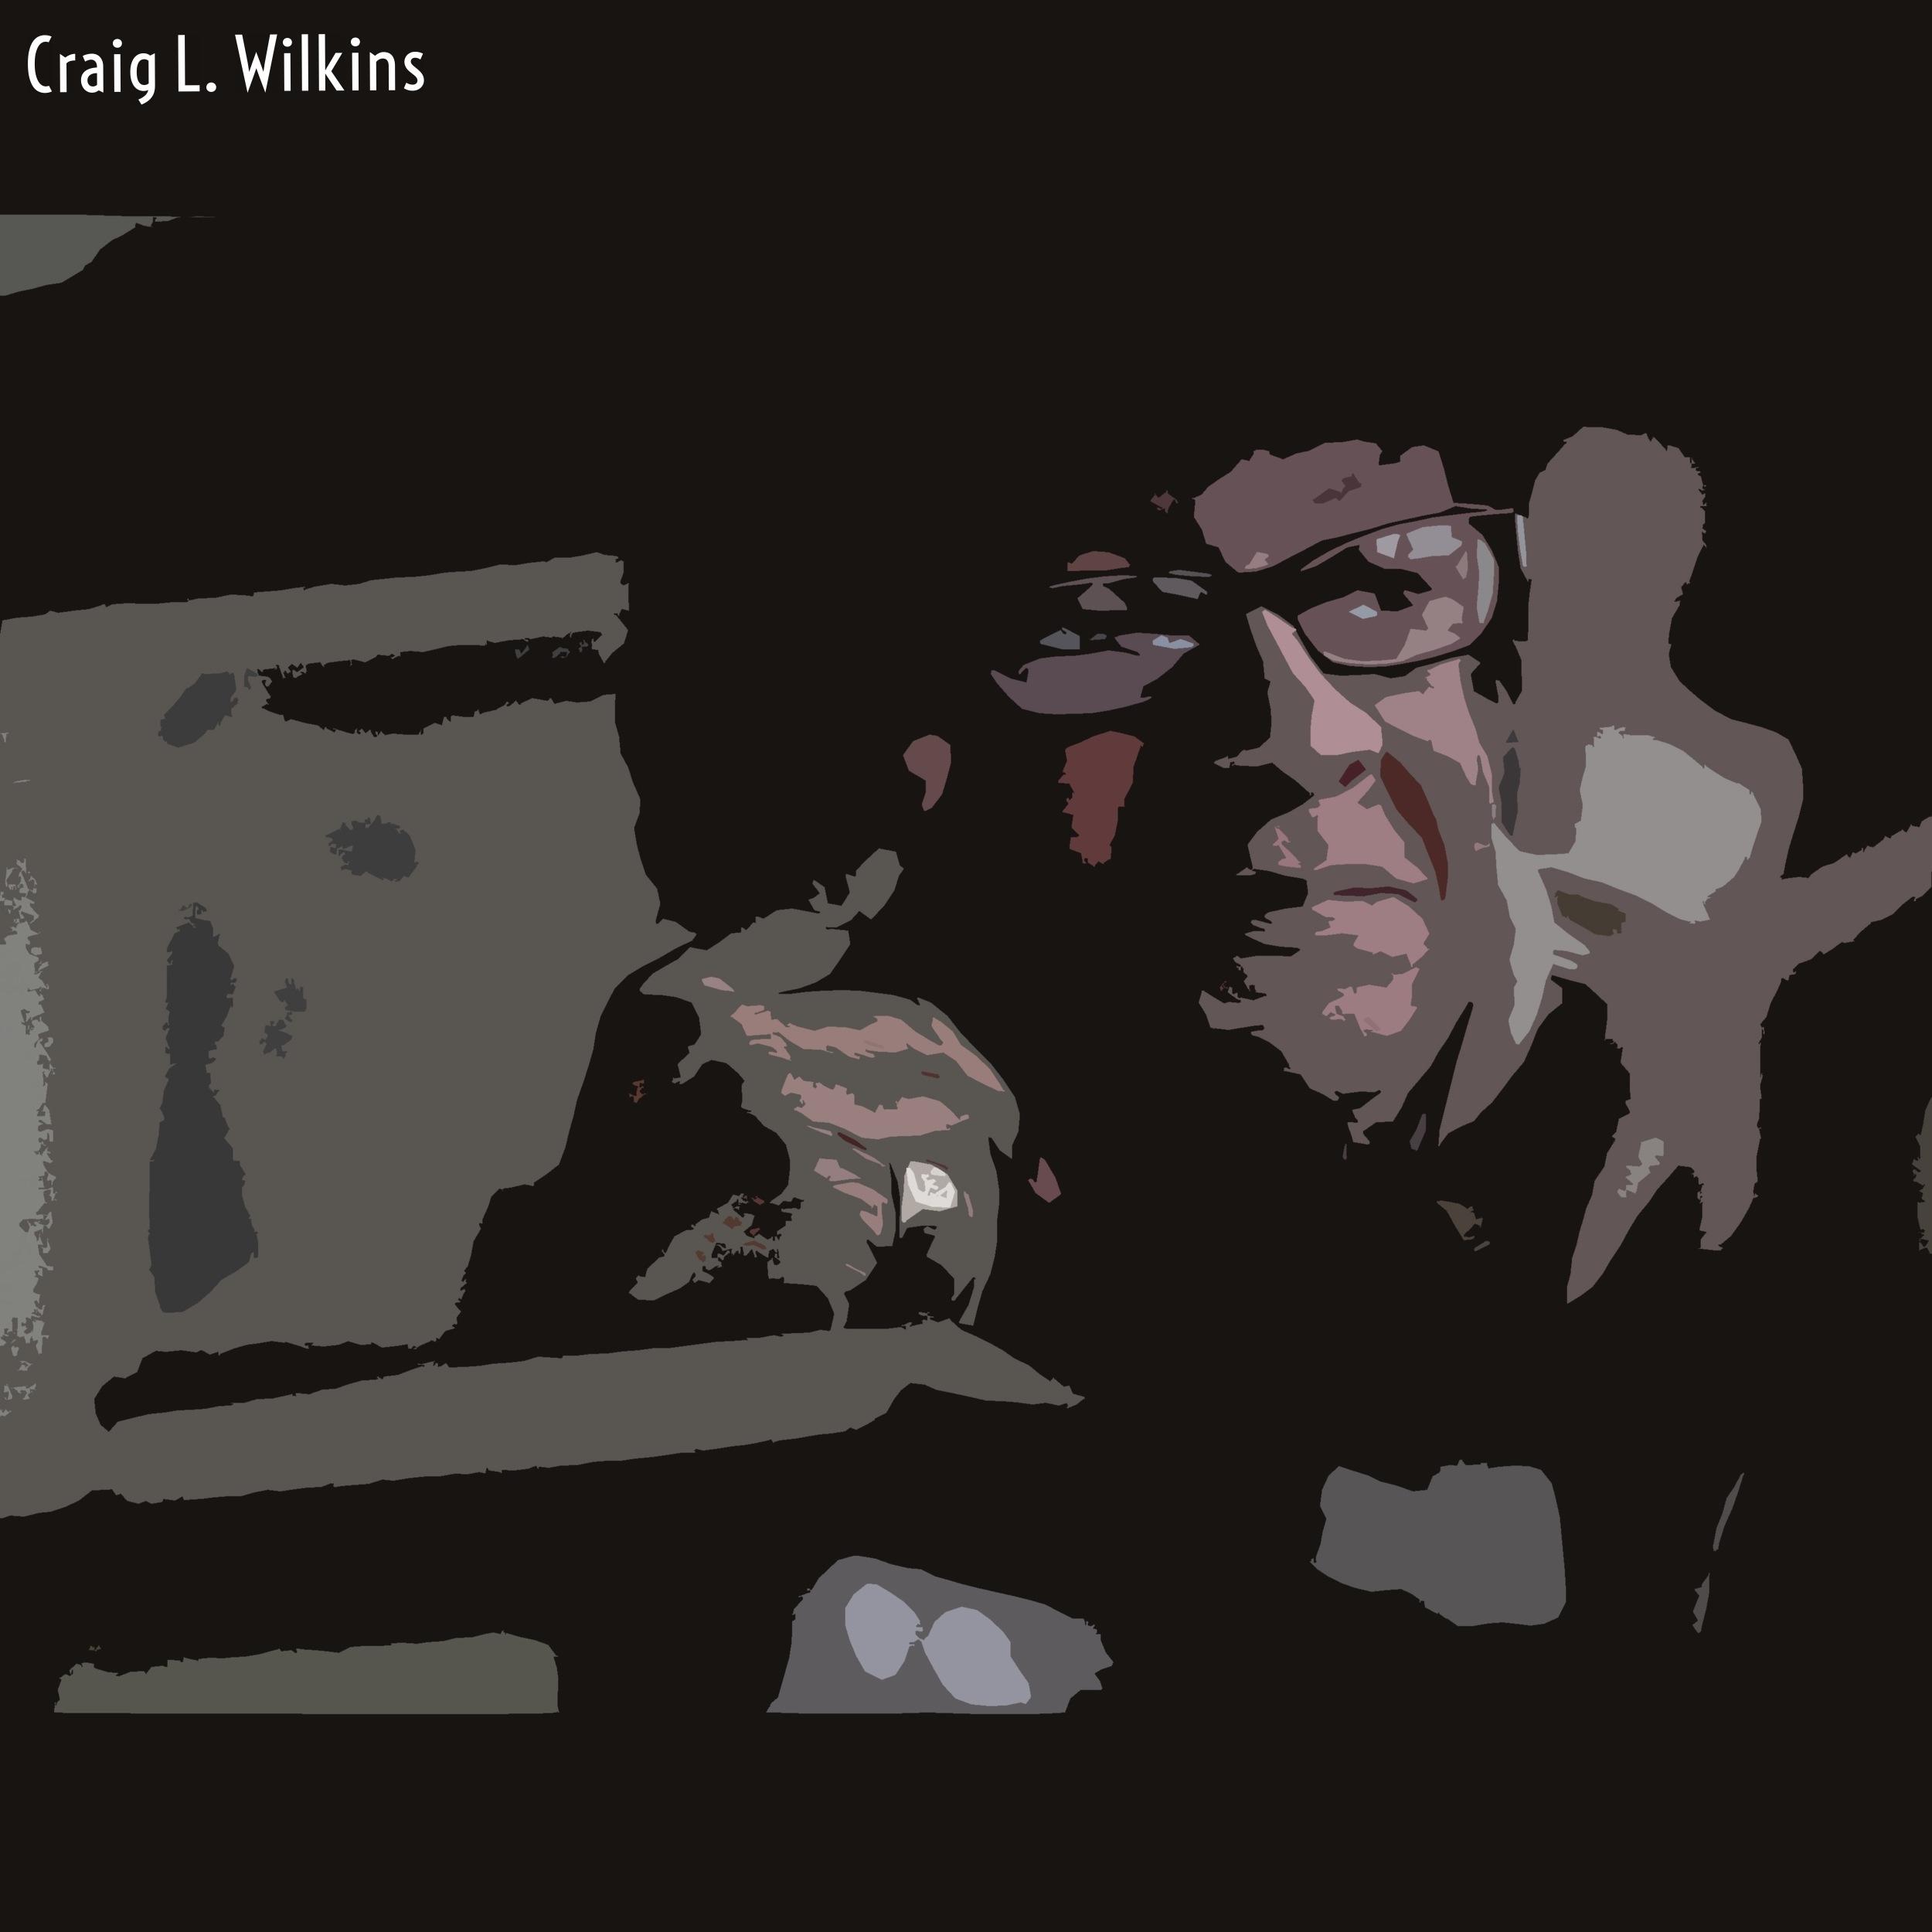 Craig L. Wilkins